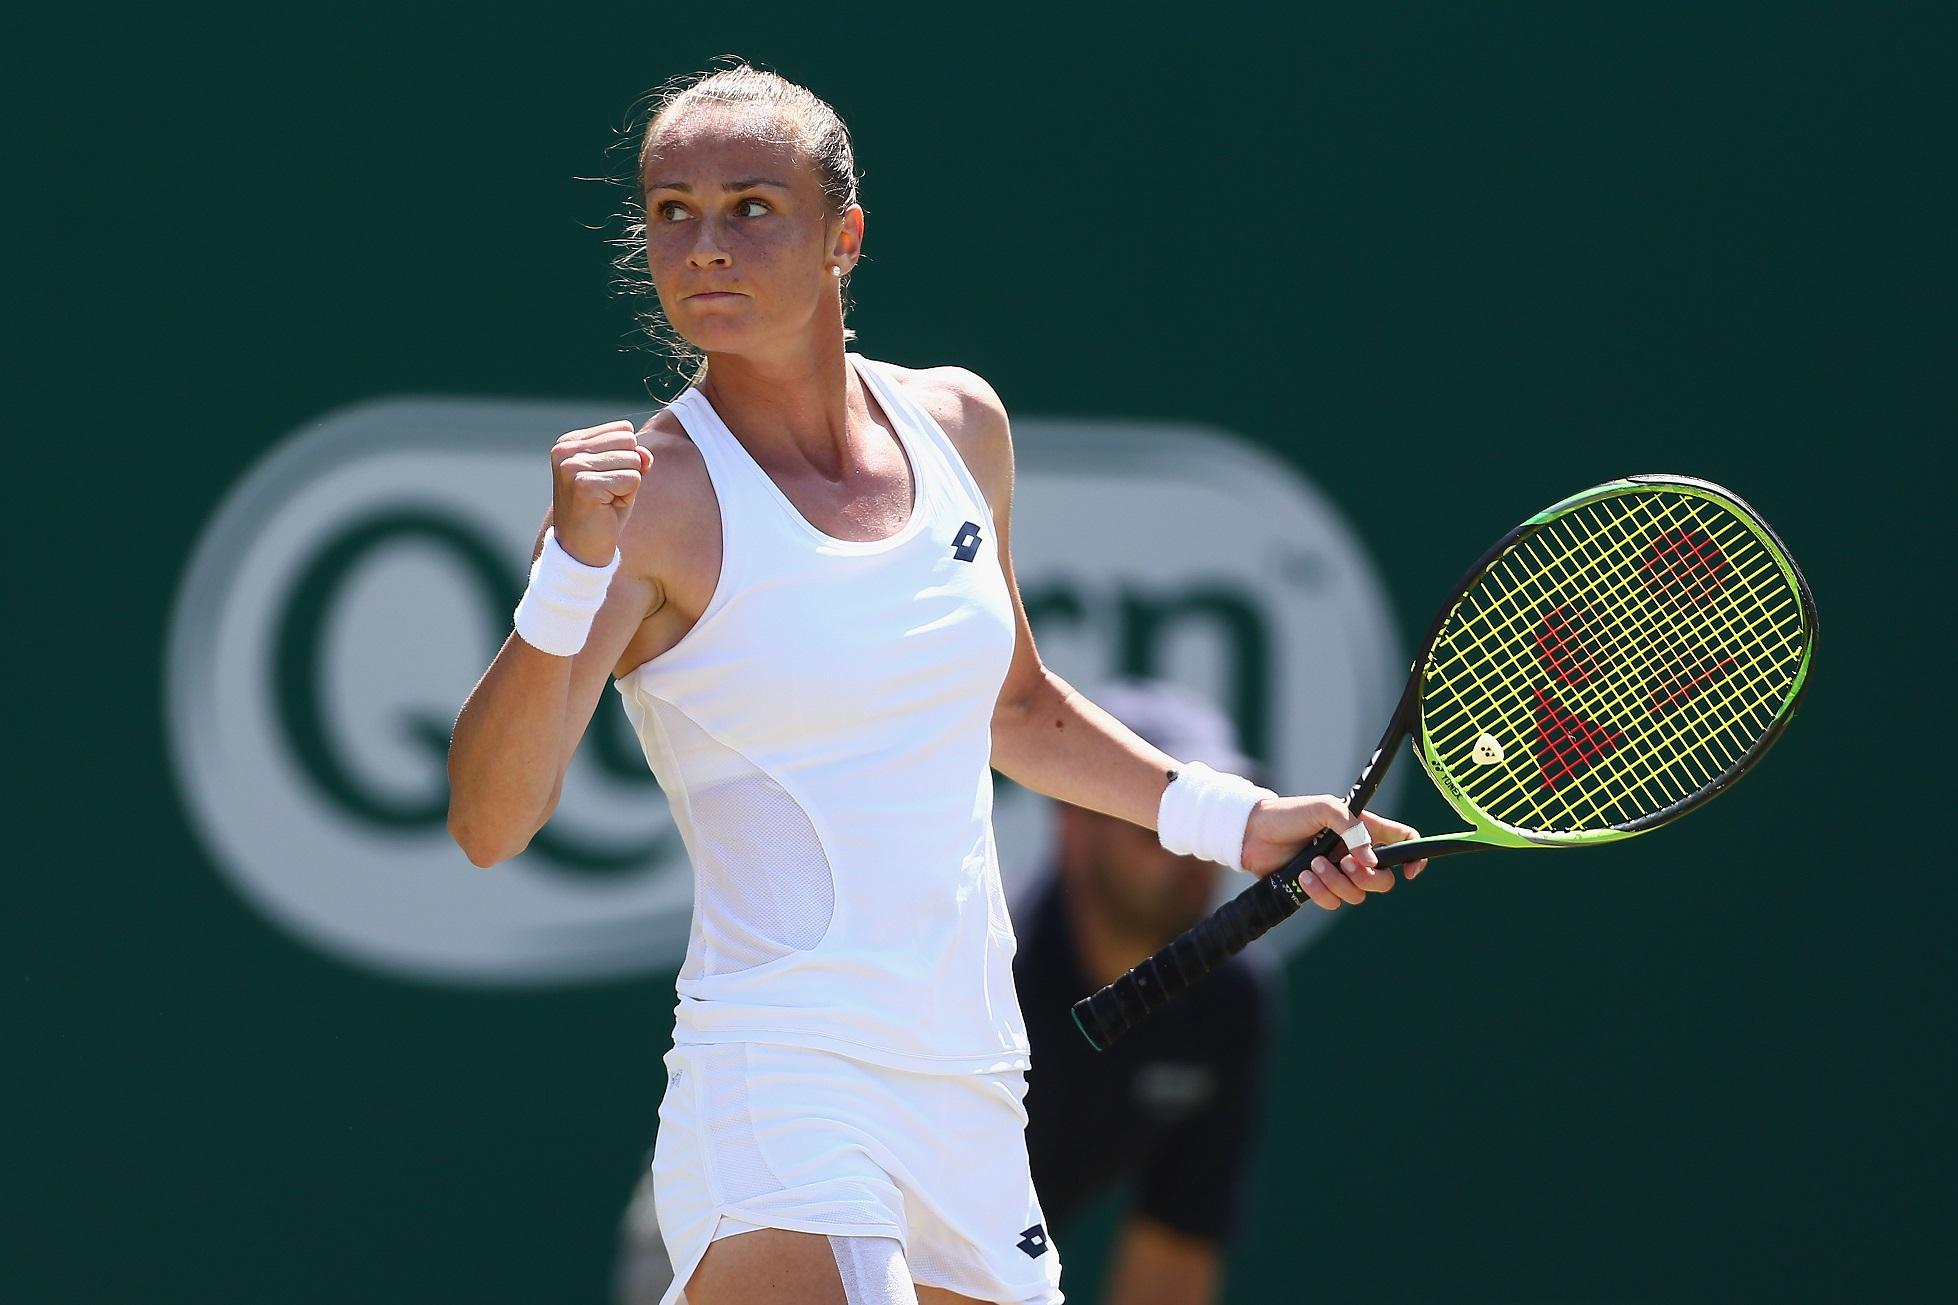 Magdalena Rybarikova of Slovakia celebrates a point during her singles Final match against Magdalena Rybarikova of Slovakia